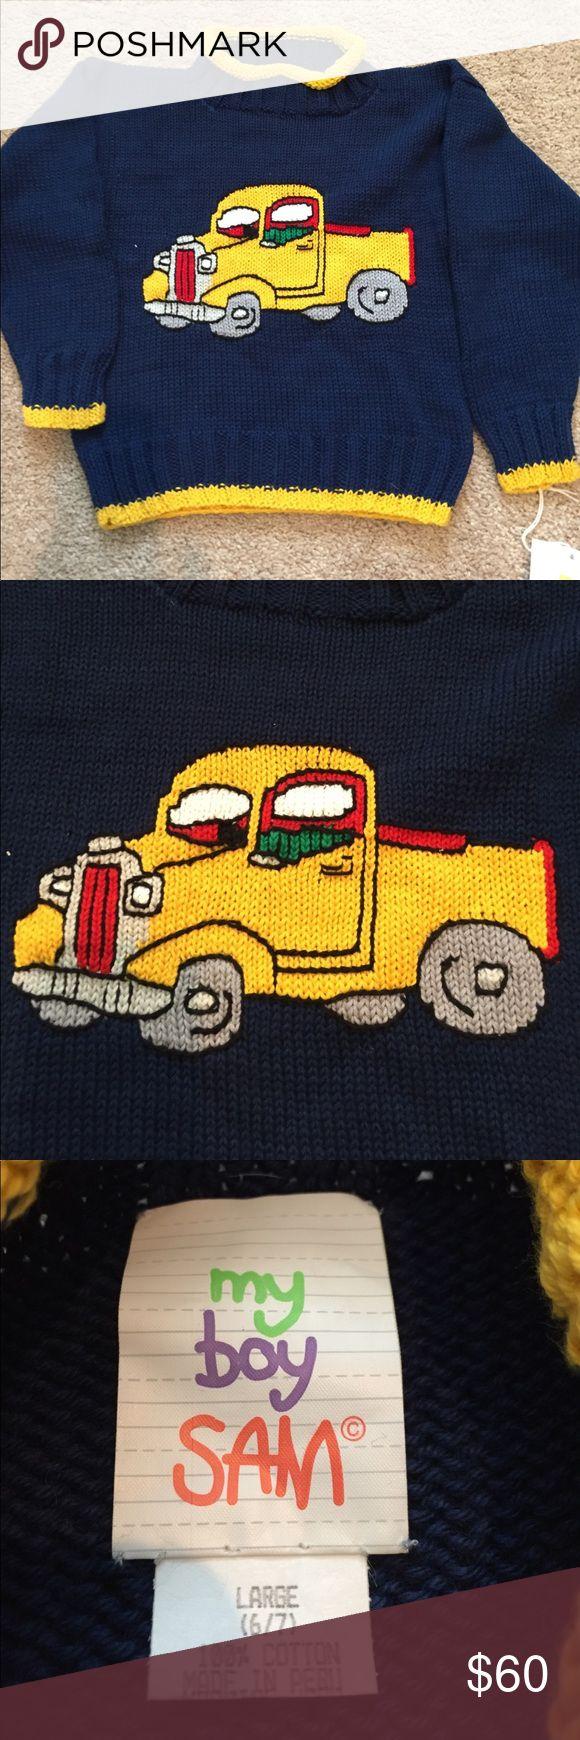 New pickup truck sweater Kids sweater 💯% cotton My Boy Sam Shirts & Tops Sweaters